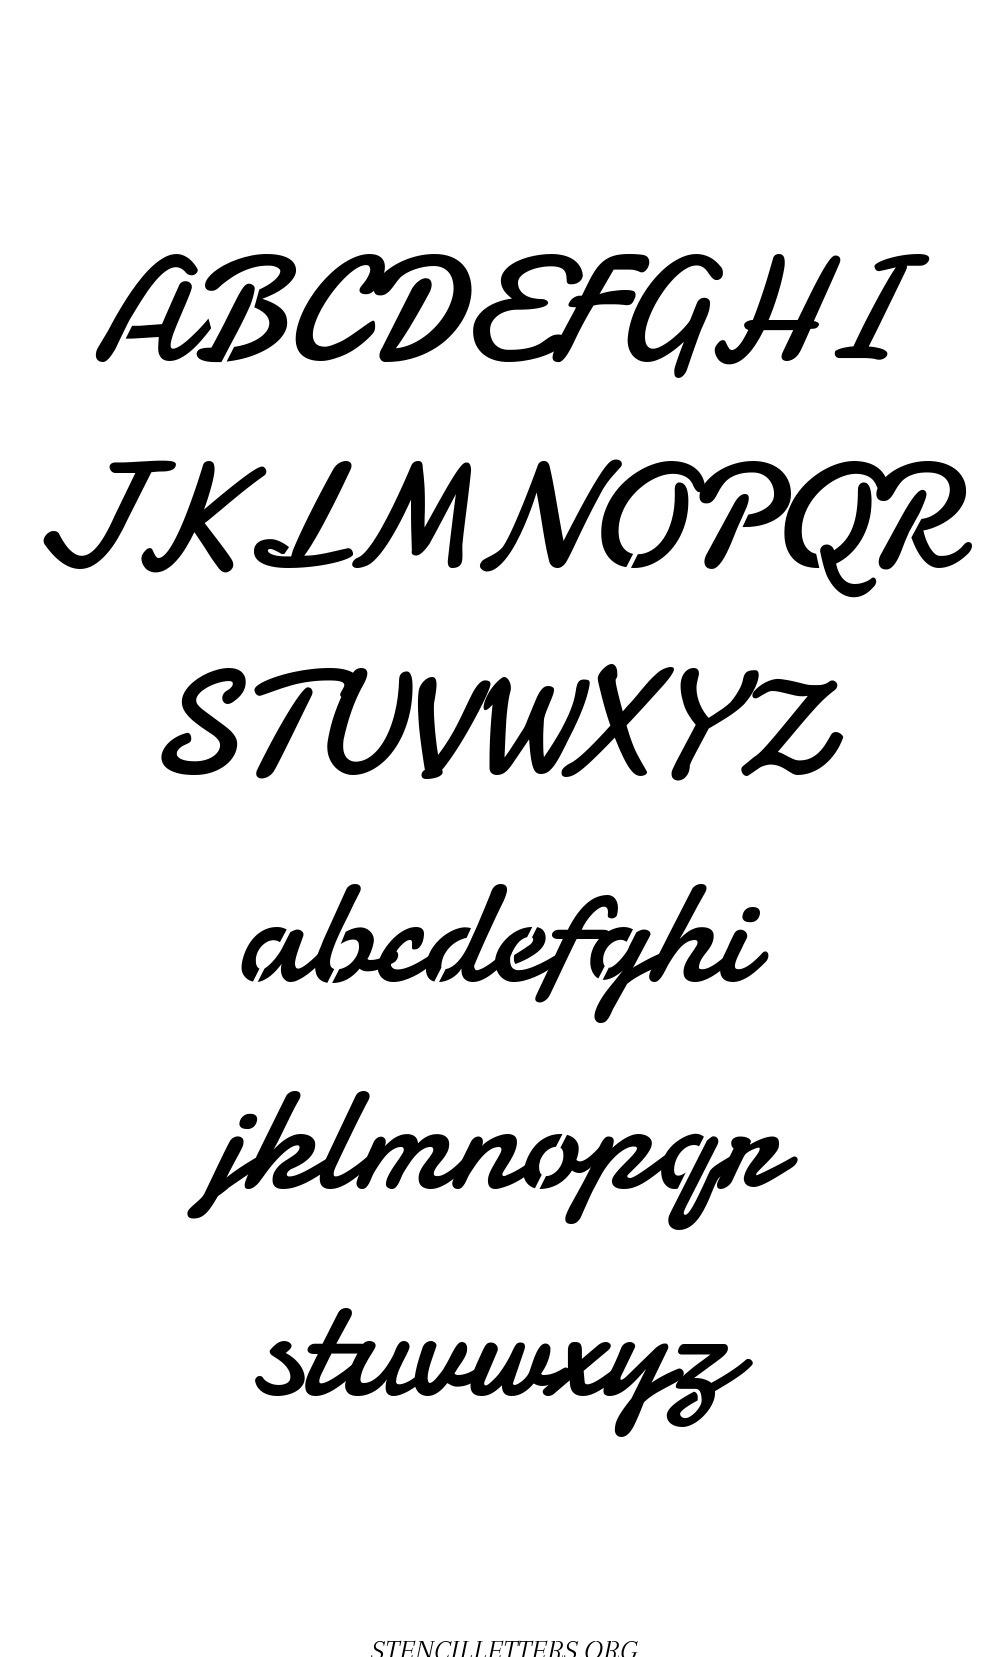 Display Script Cursive free printable letter stencils